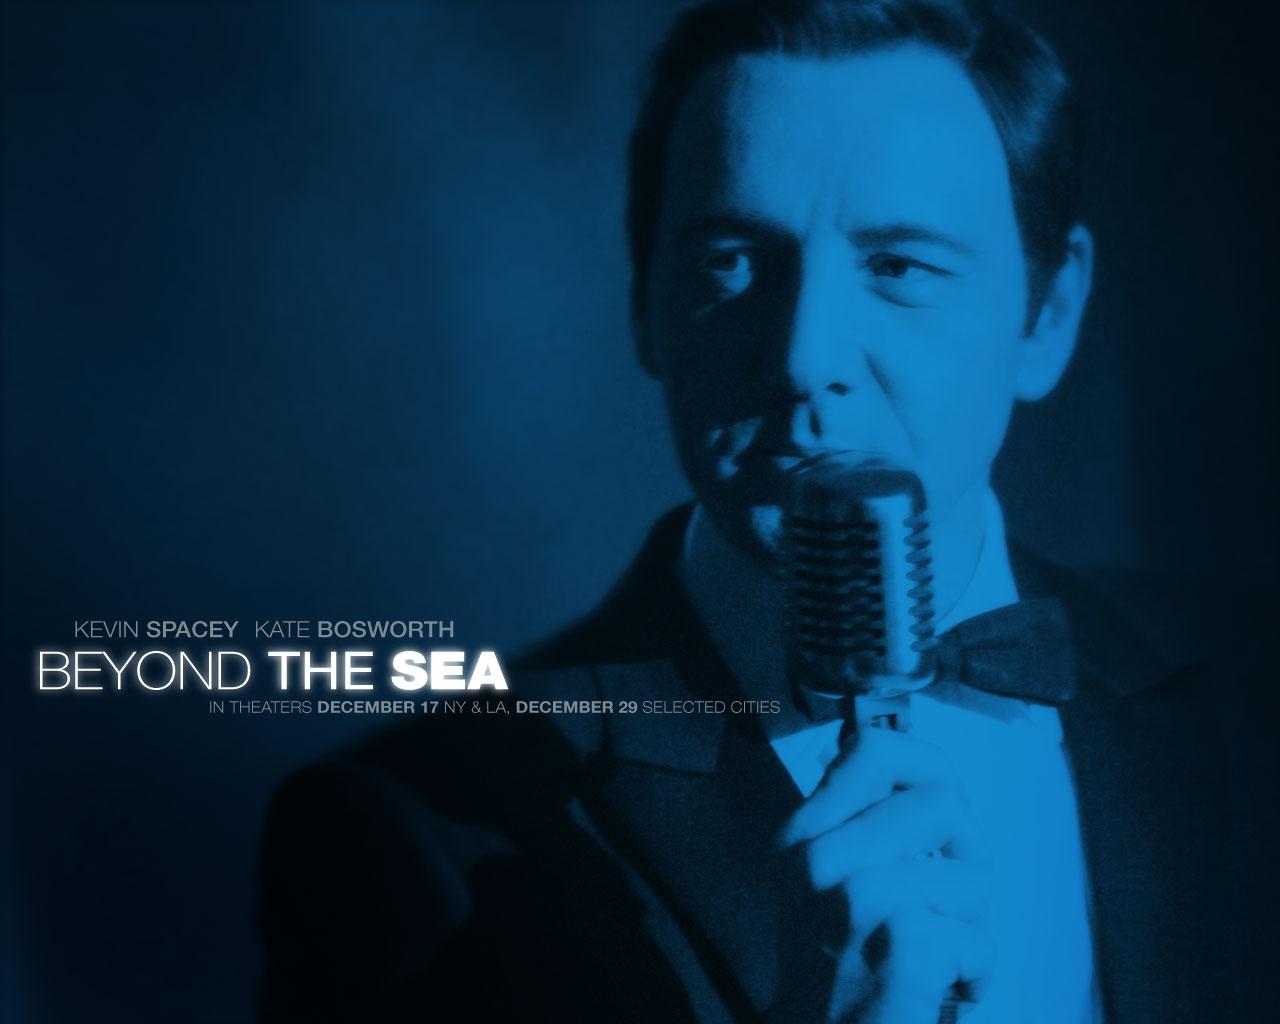 beyond_the_sea-le-film